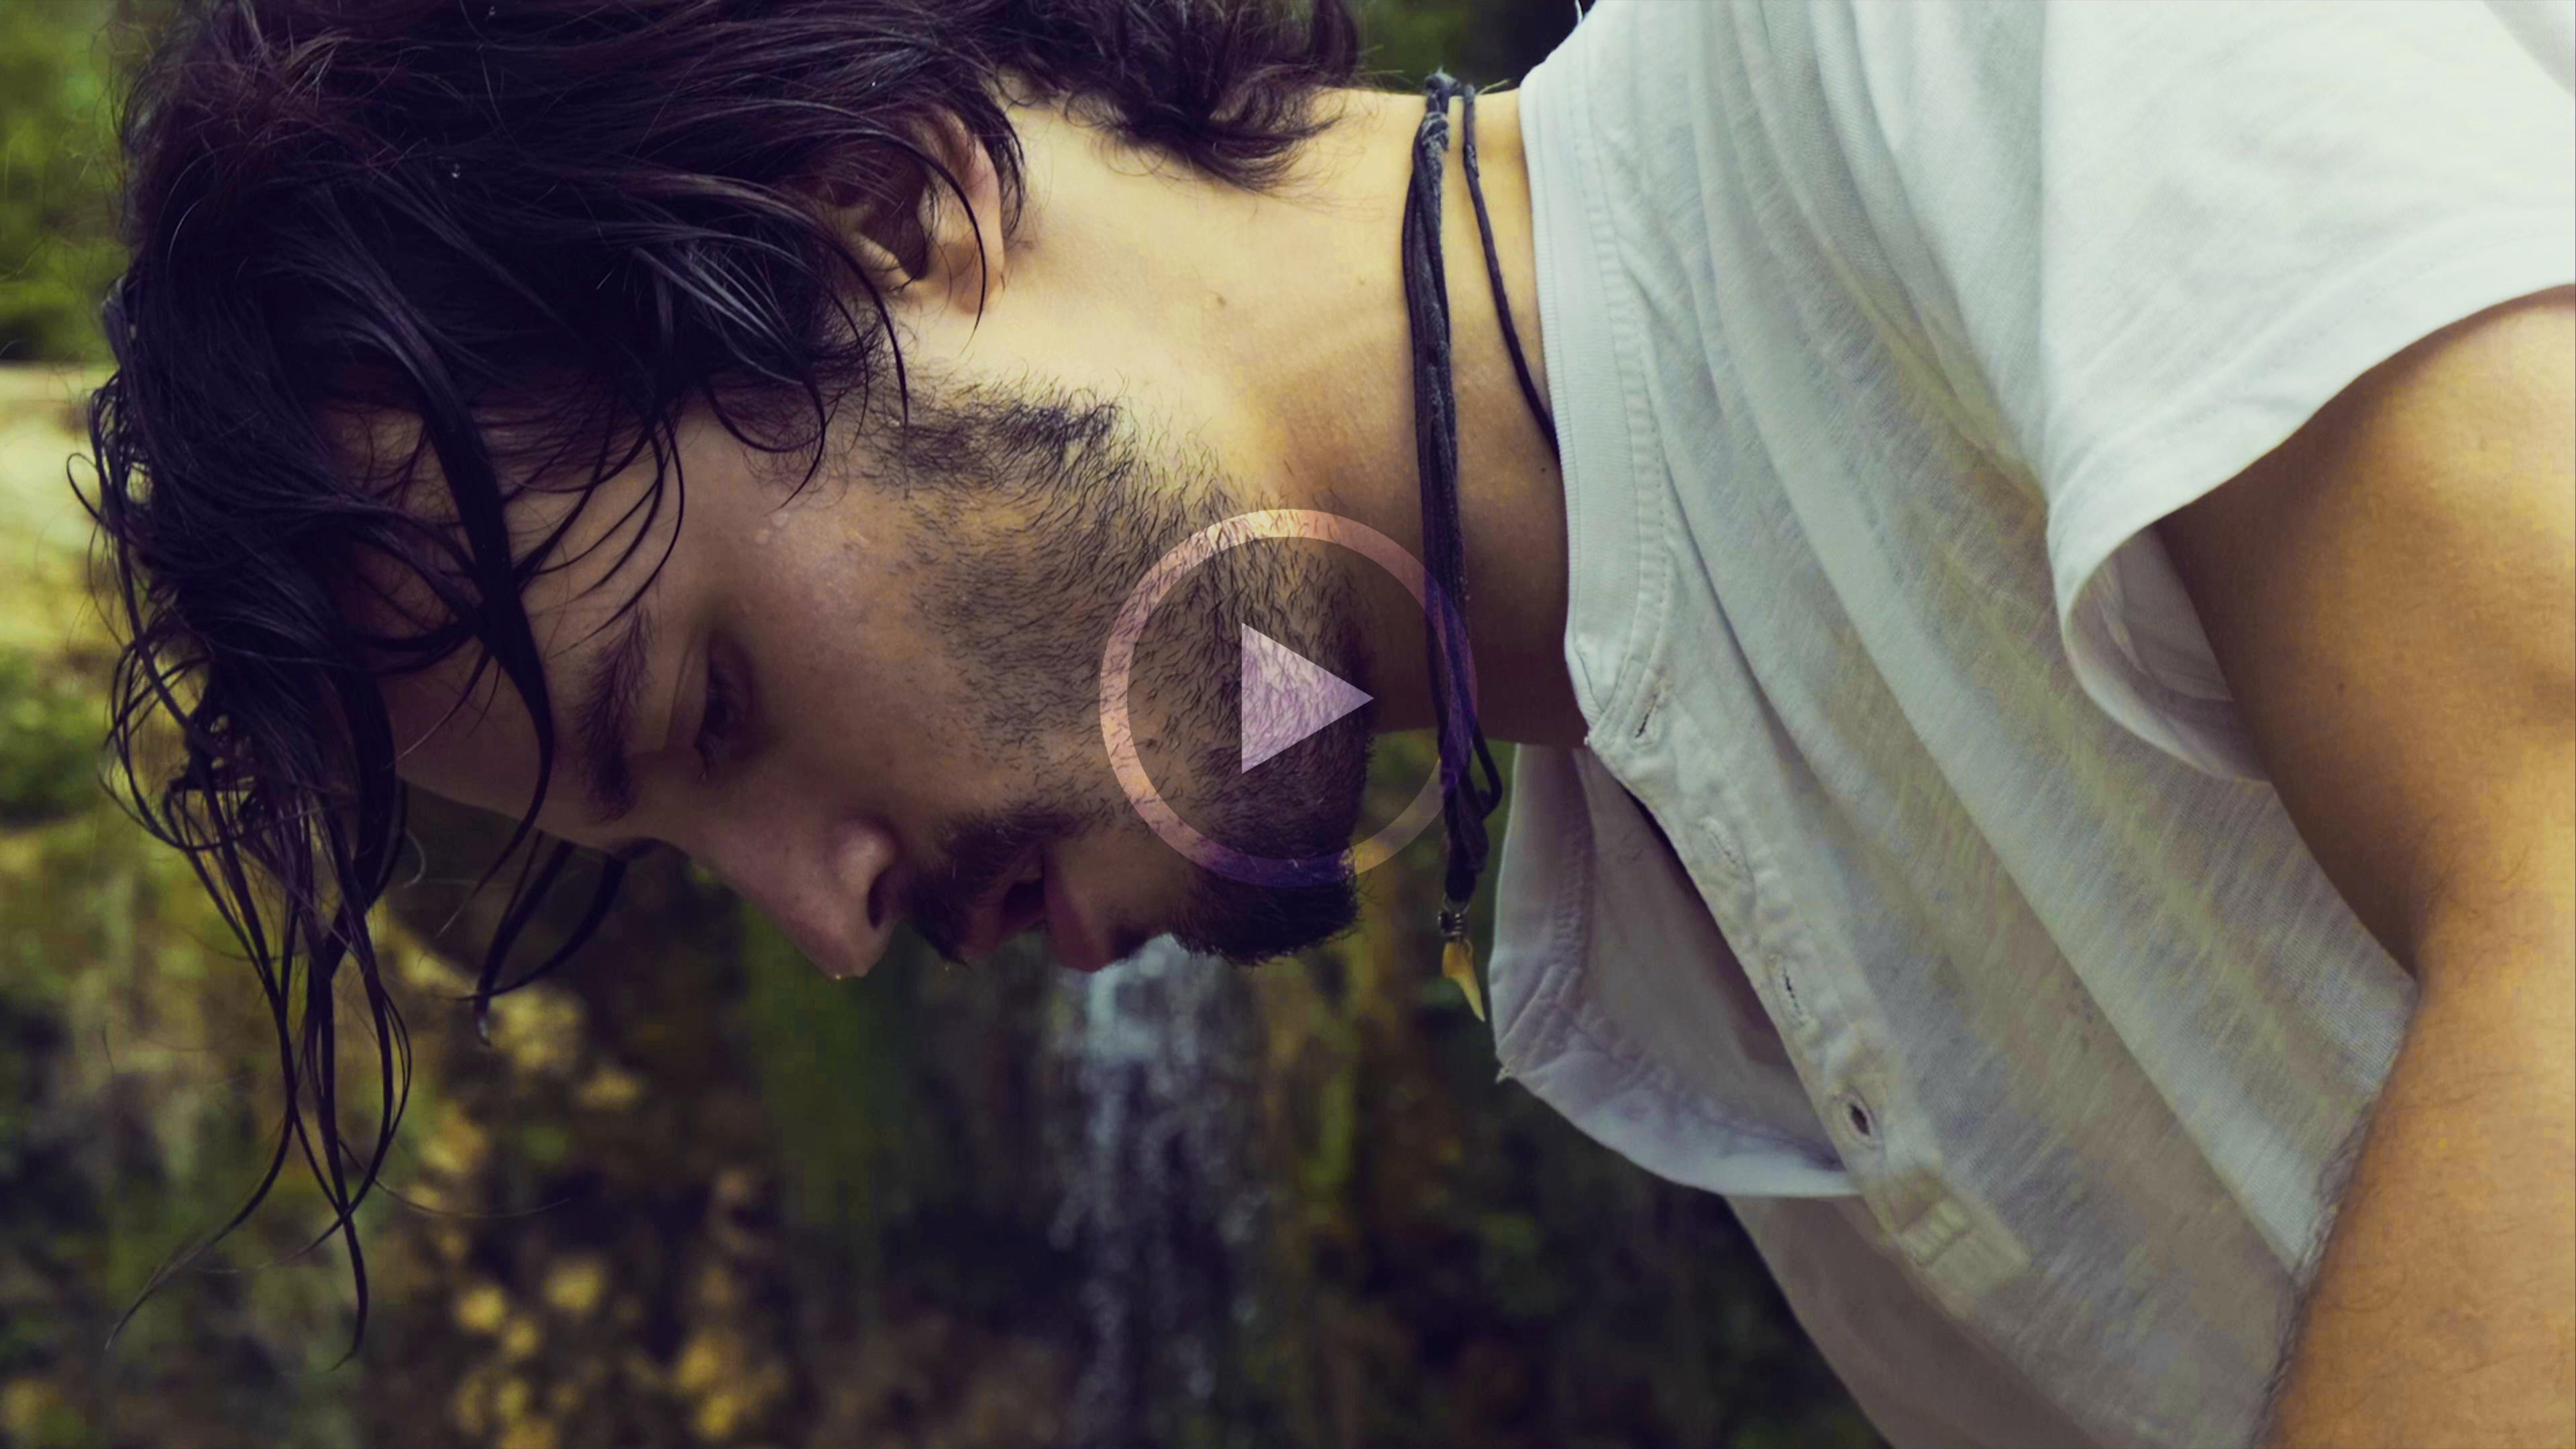 VIENTO LIBRE | Videoclip (Dir. Bernat Balaguer)